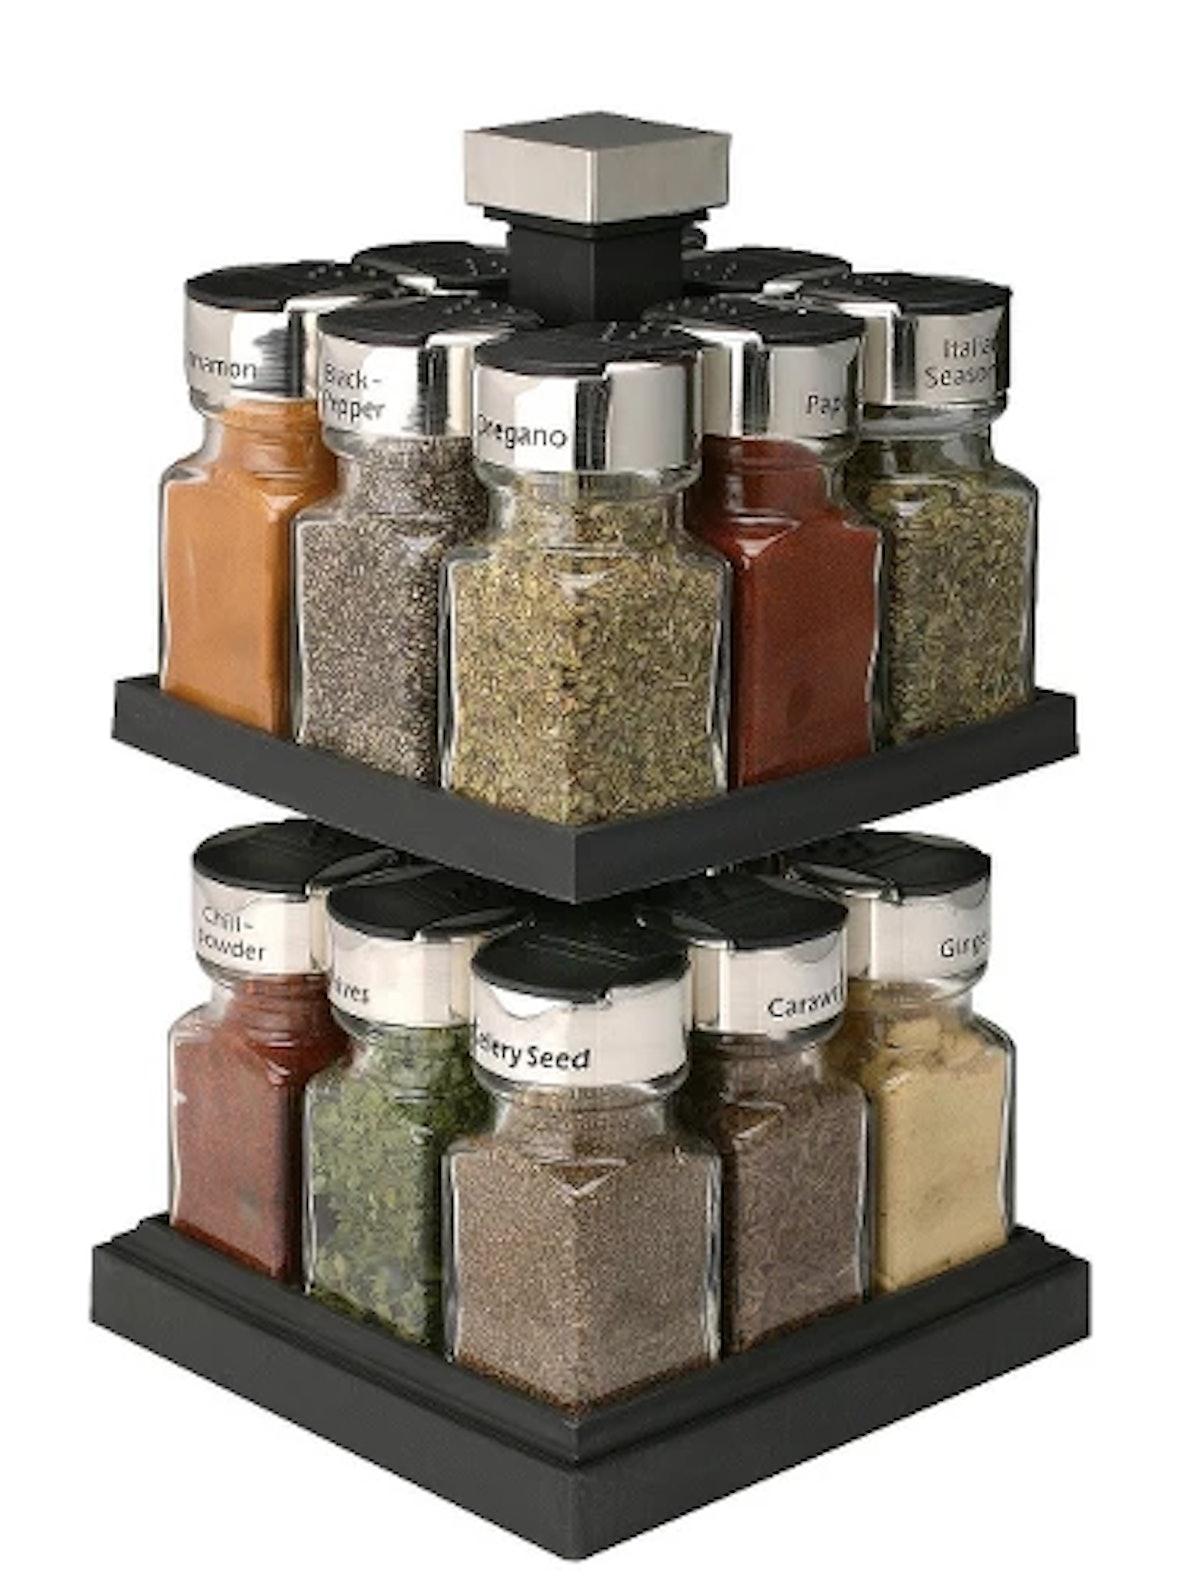 Square Rotating 16 Jar Spice Rack - Olde Thompson